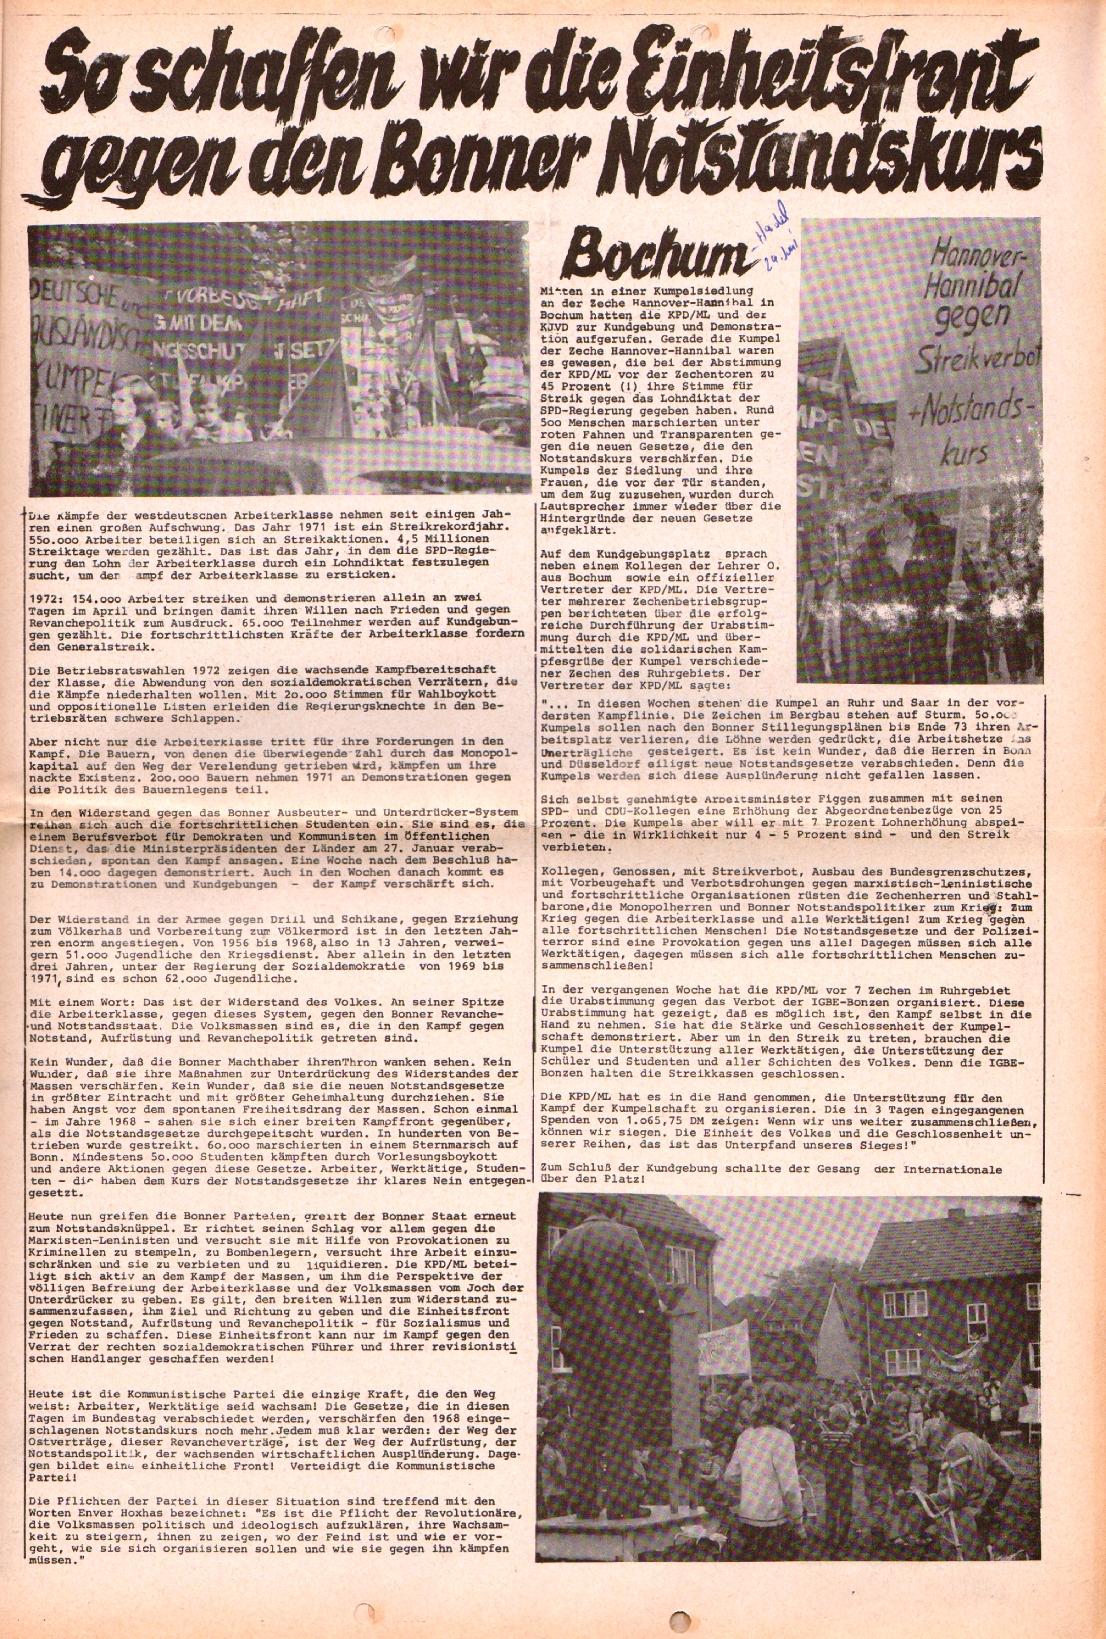 Rote Fahne, 3. Jg., 28.6.1972, Nr. 13, Beilage, Seite 1